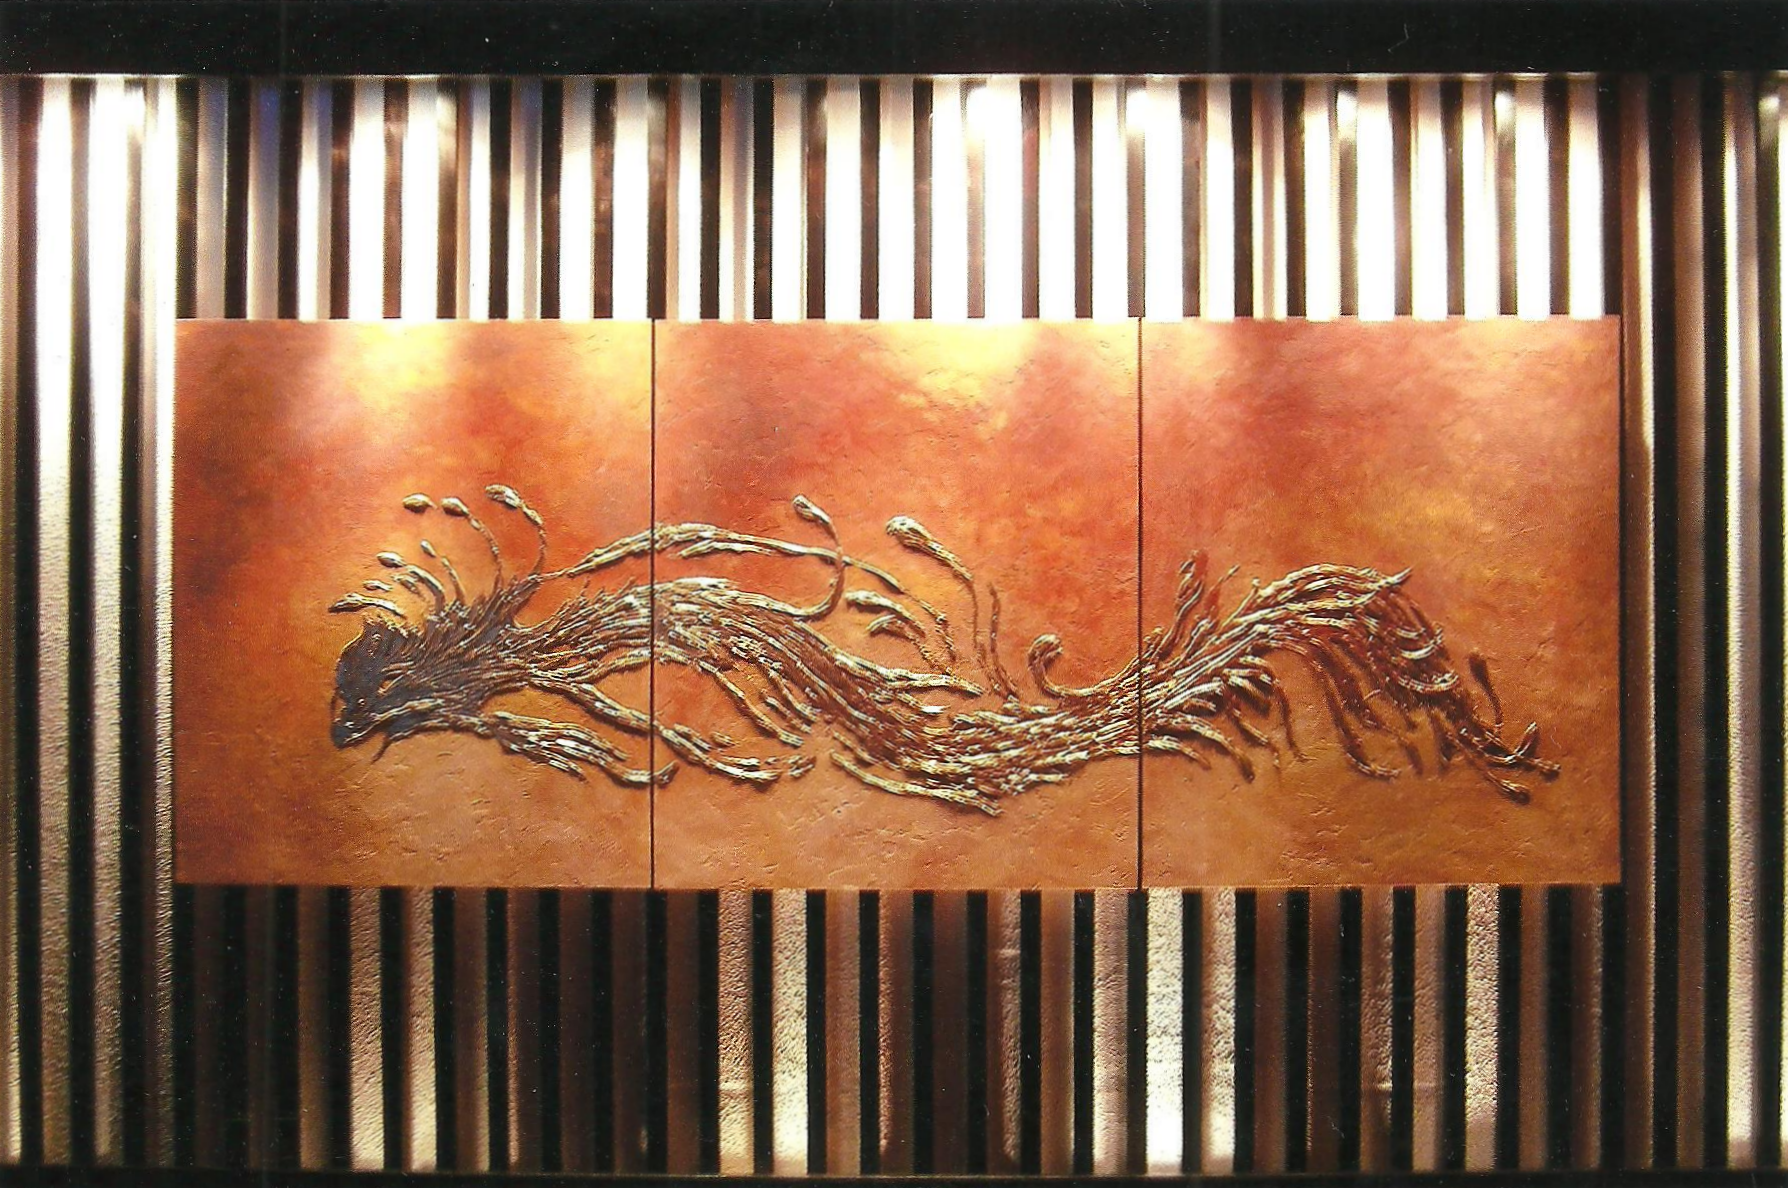 View an enlarged image of this dragon wall in miyabi s